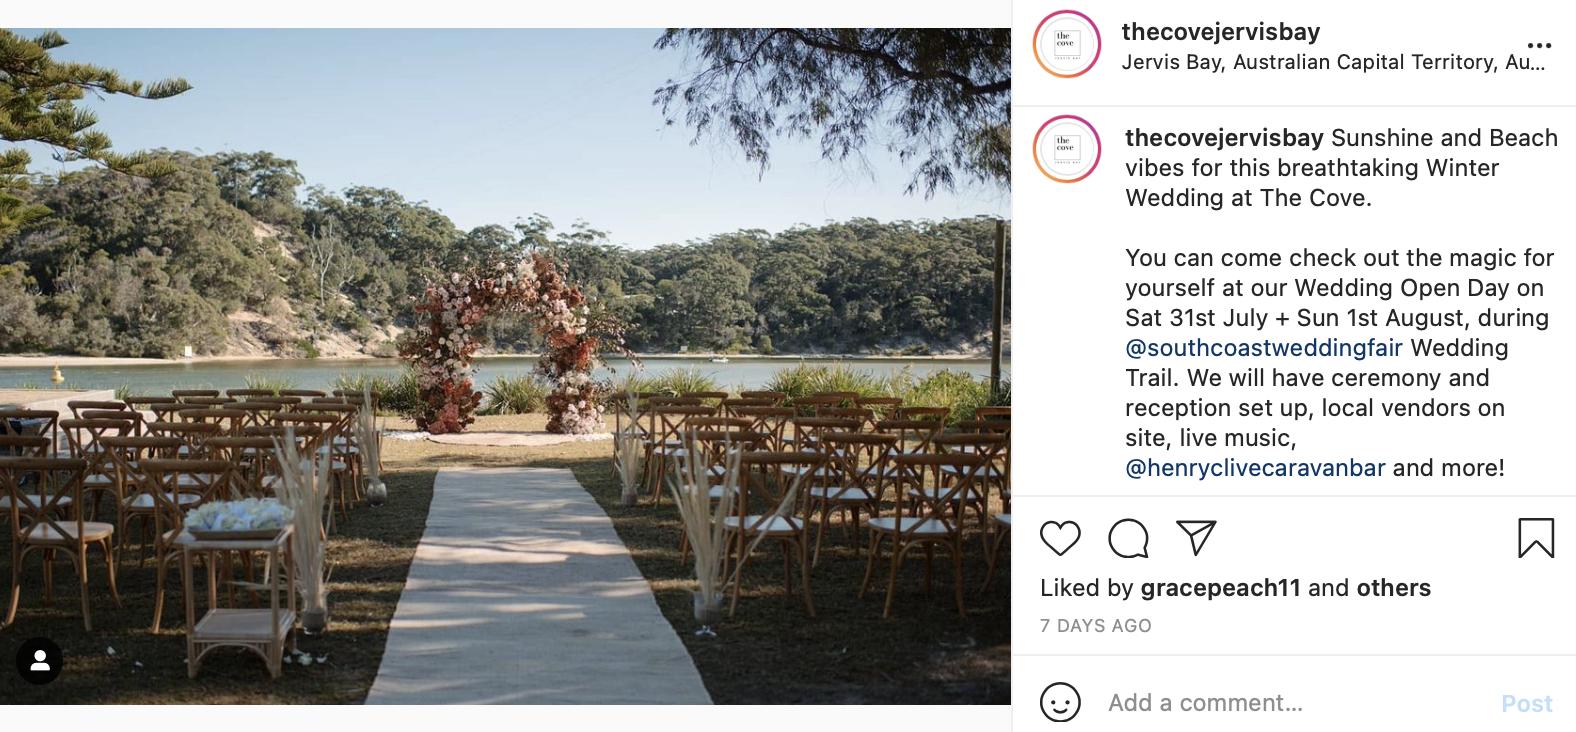 Jervis Bay wedding reception